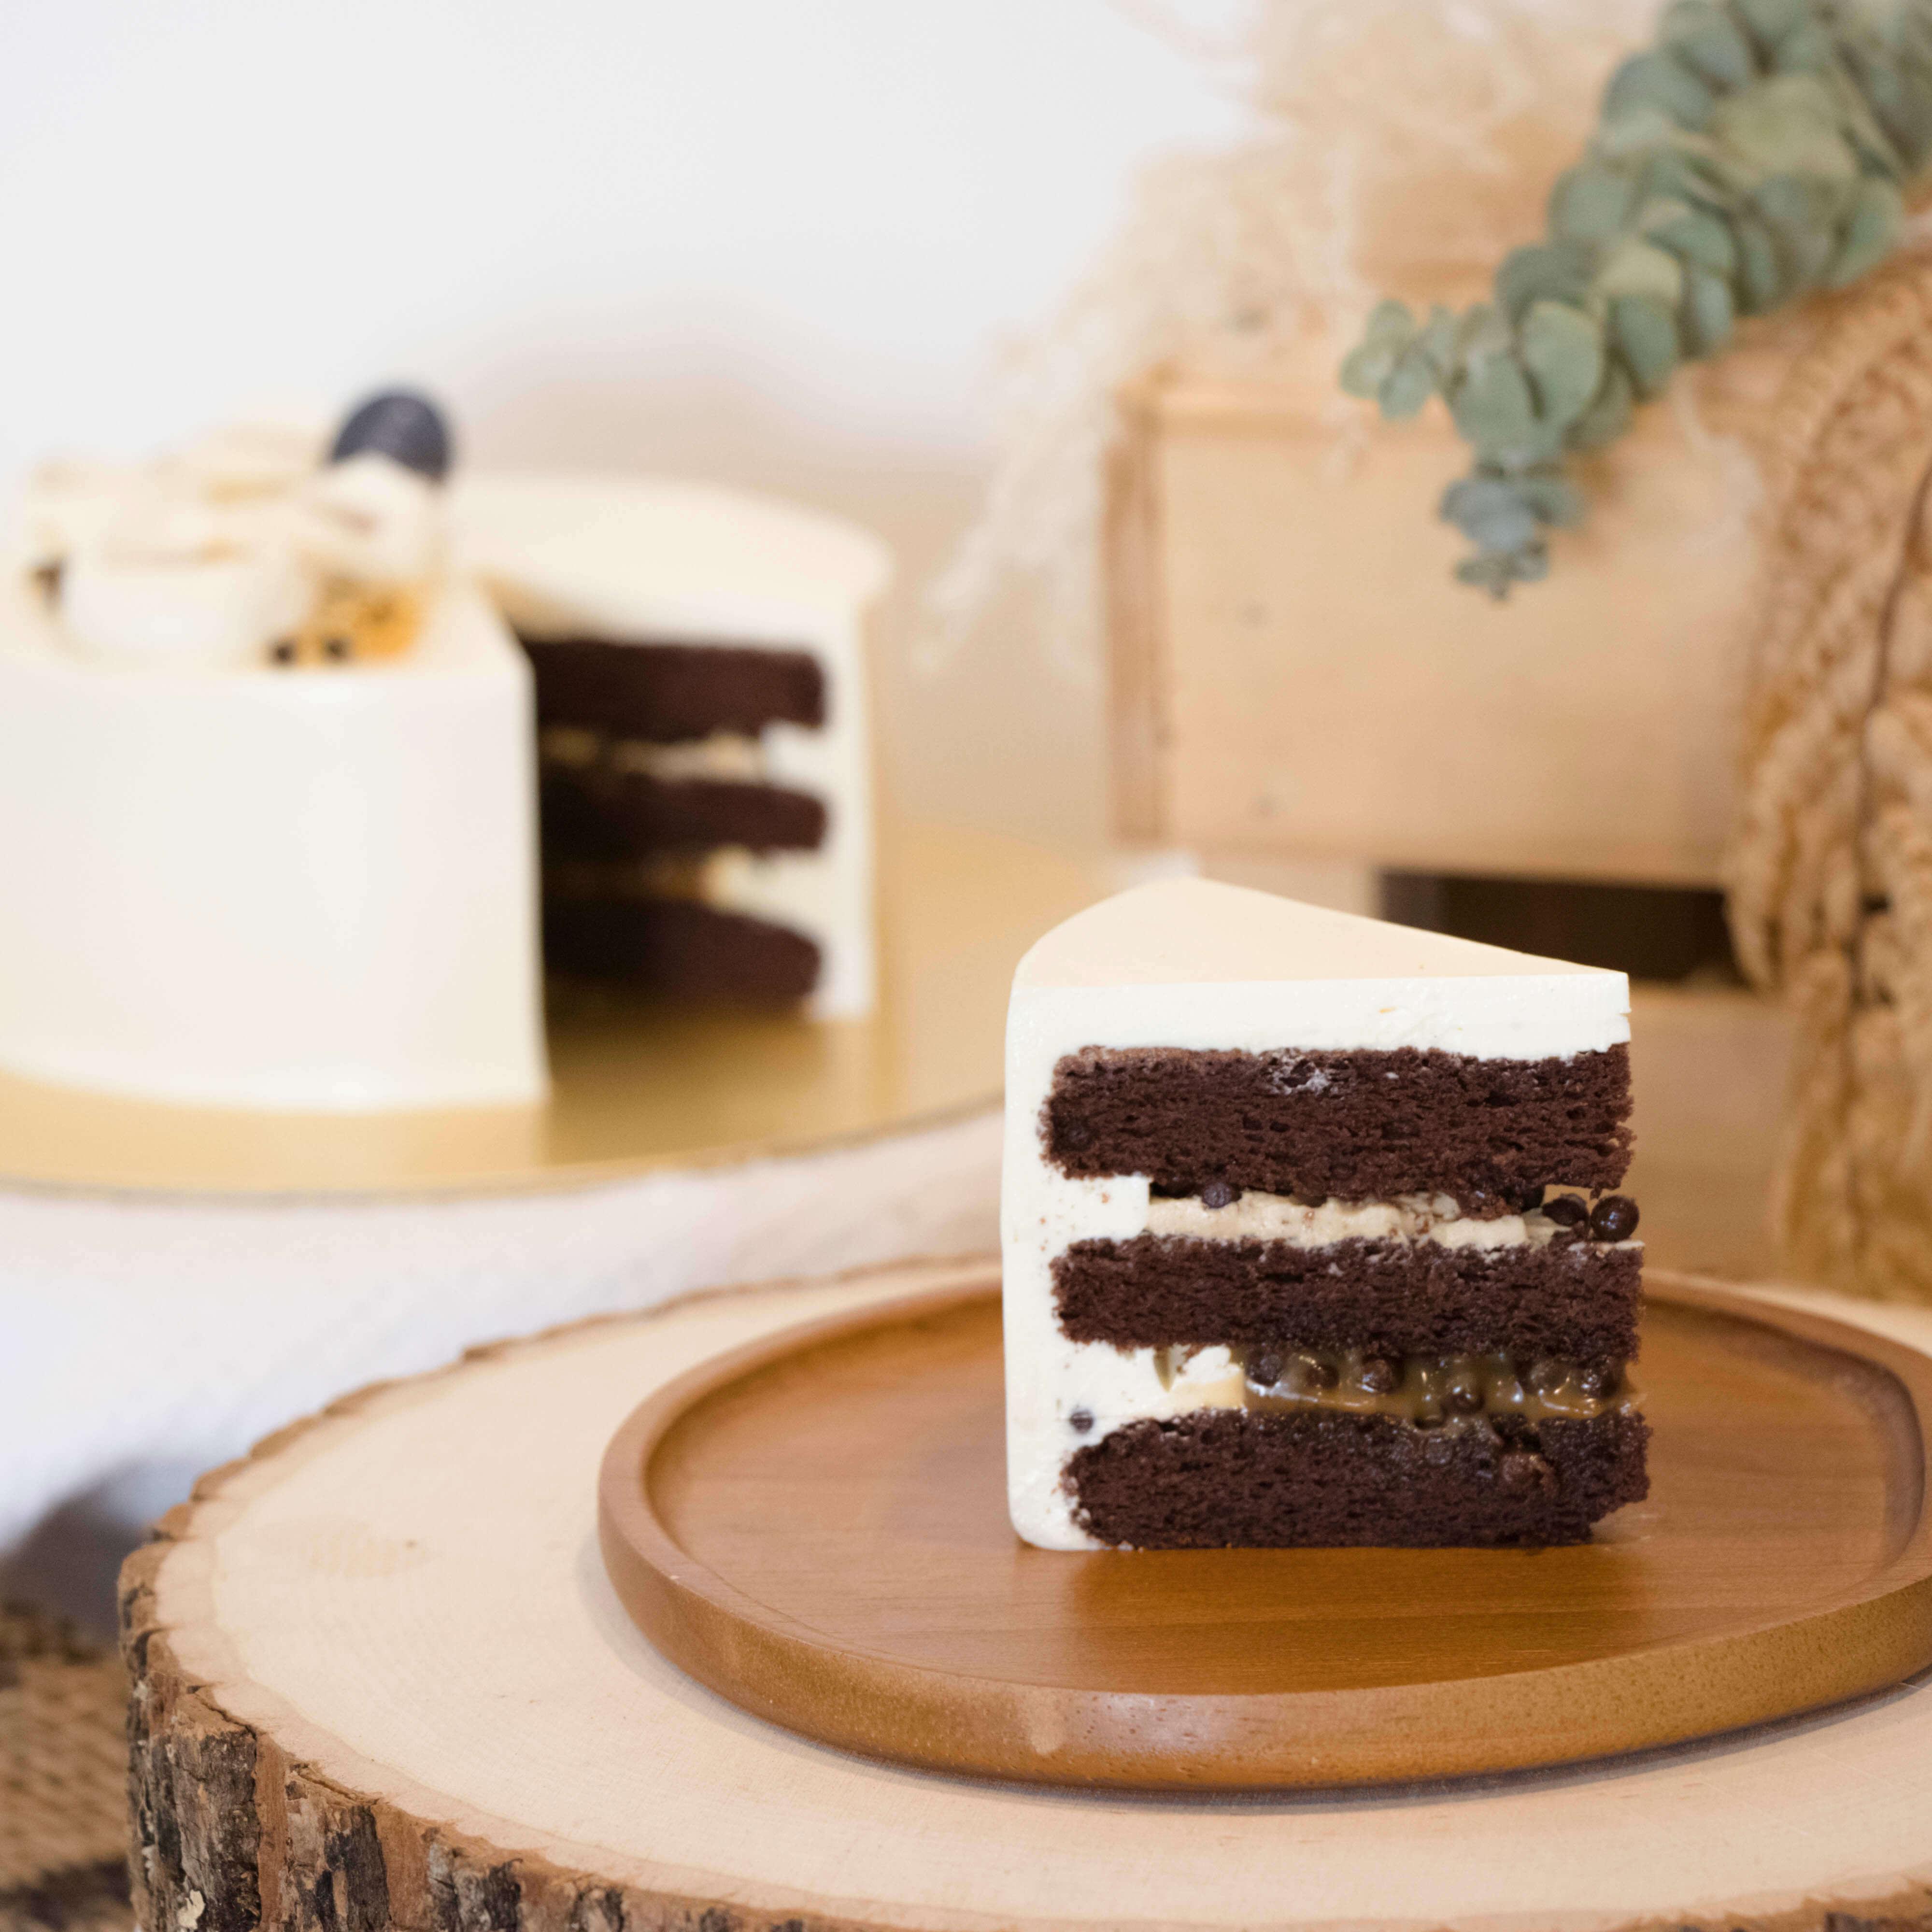 Sea Salt Caramel Chocolate Cake